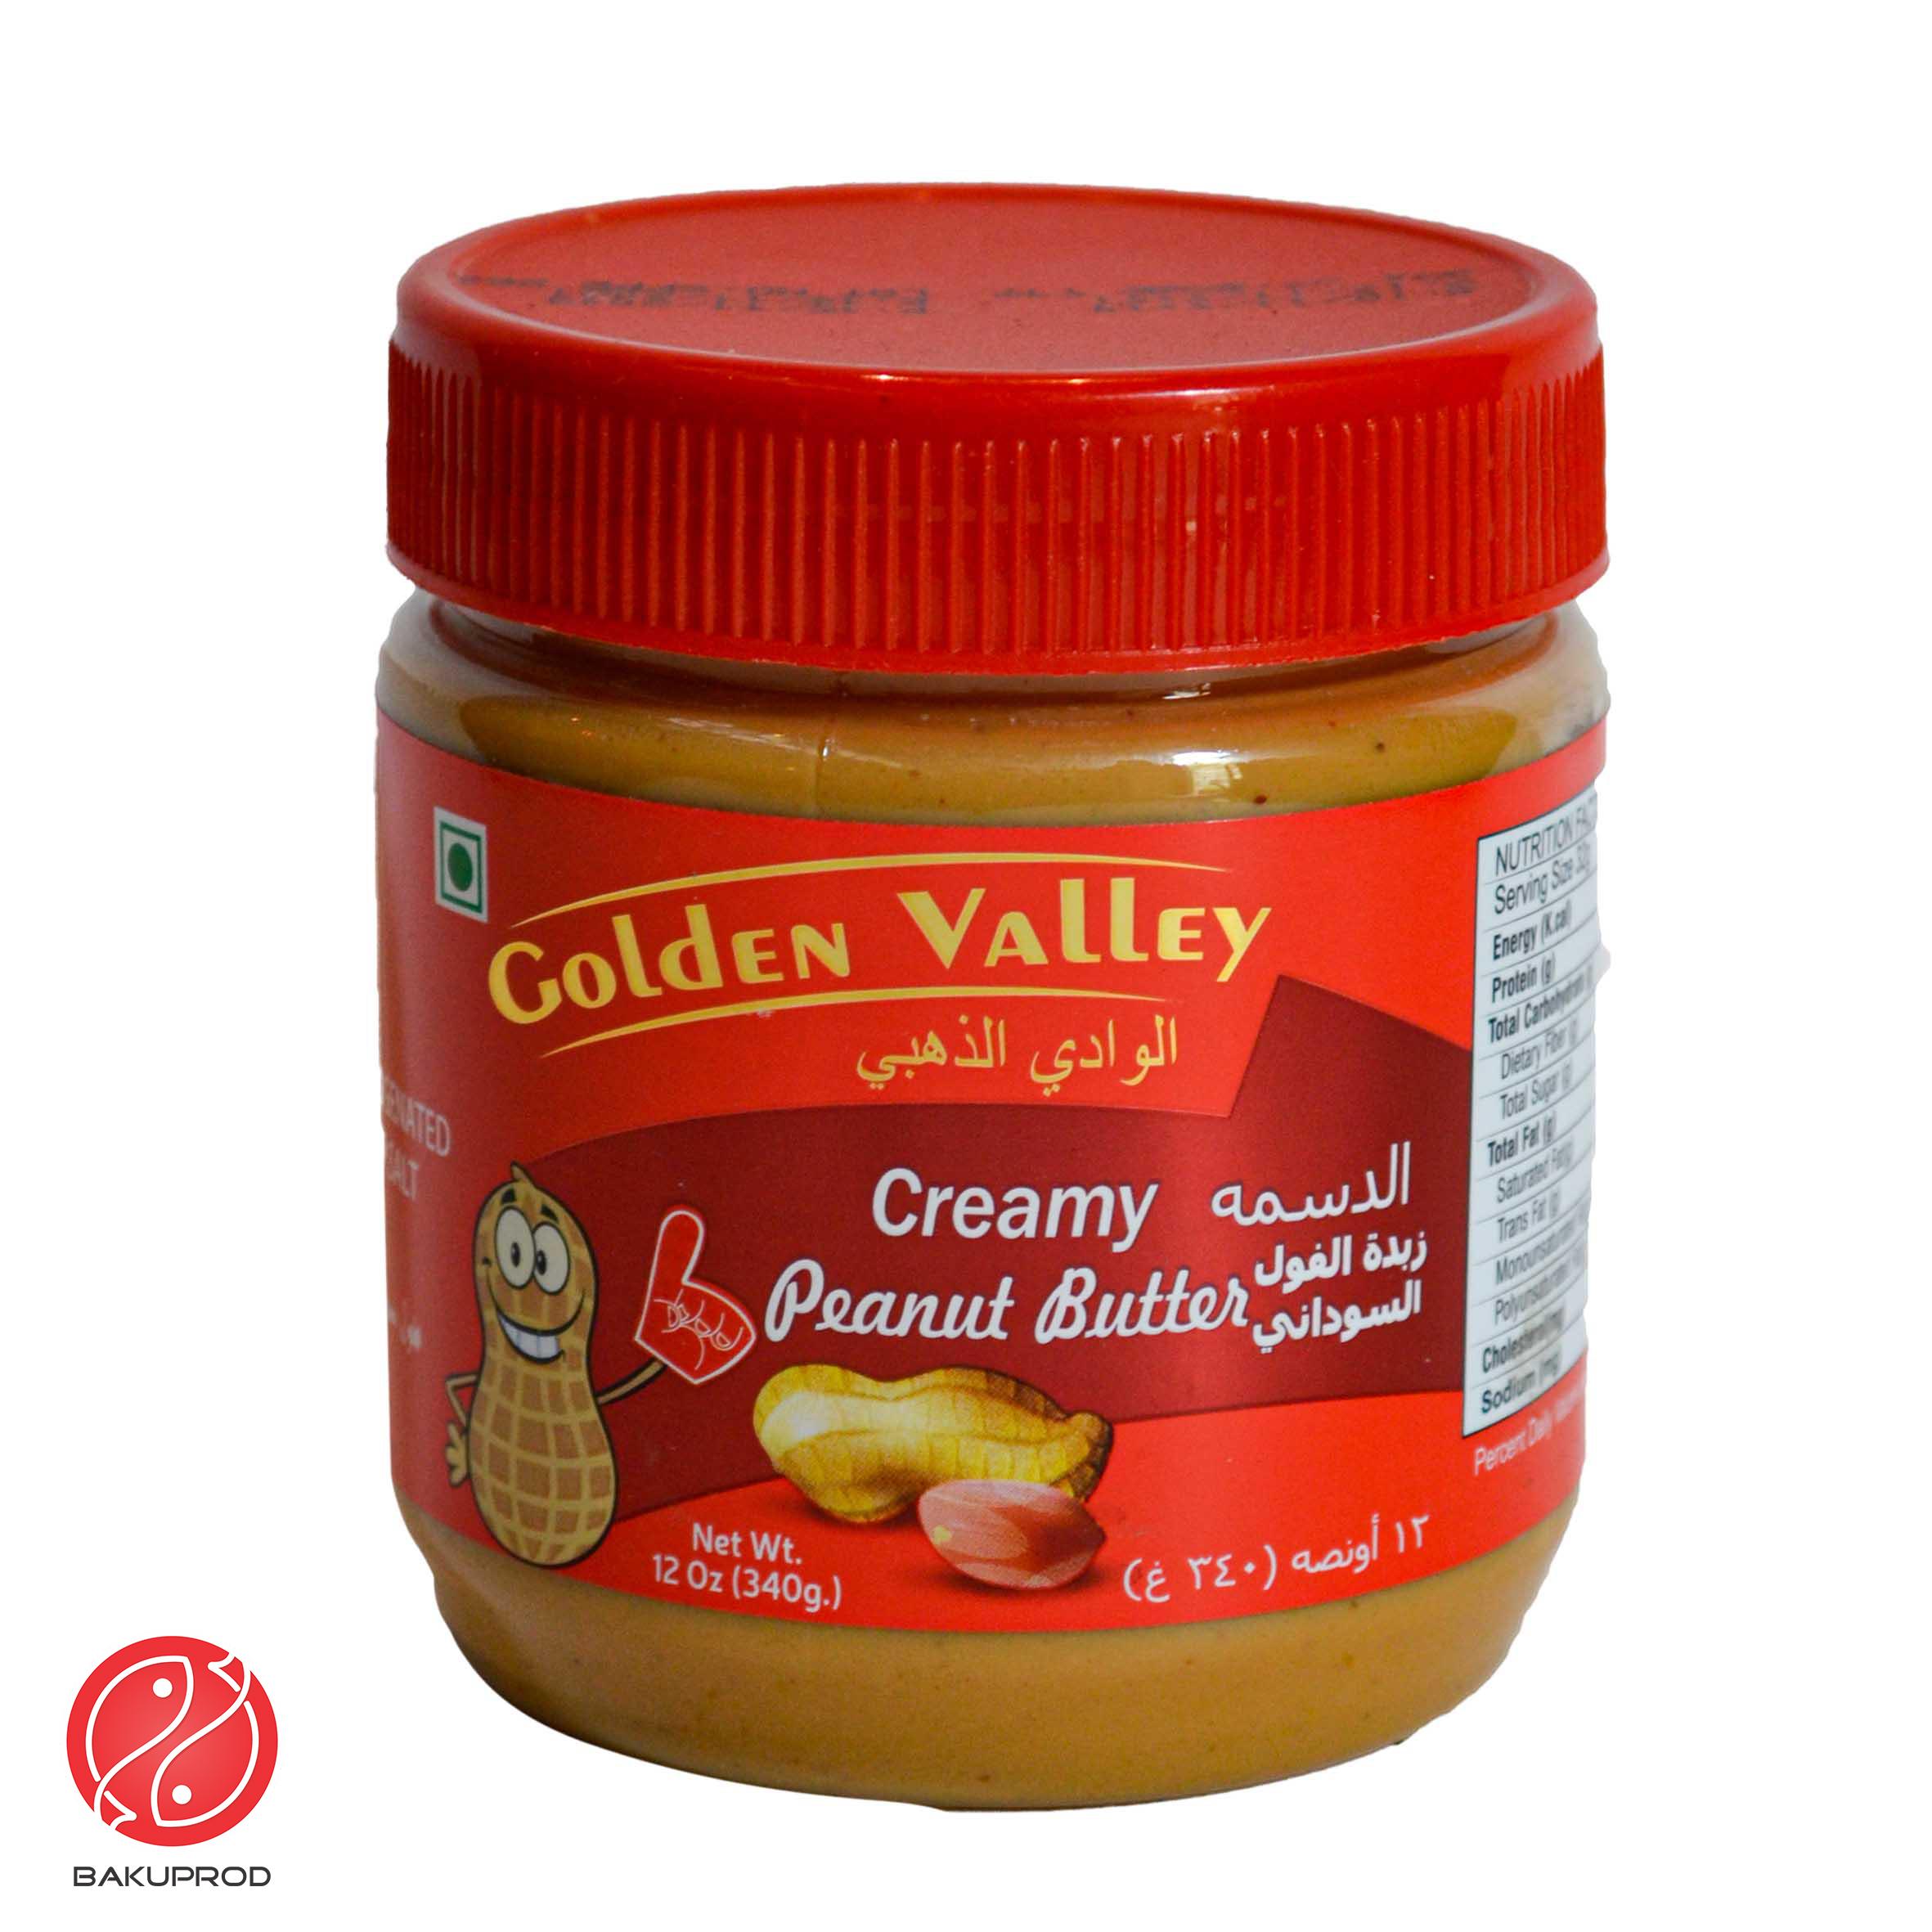 Peanut Butter Cremy